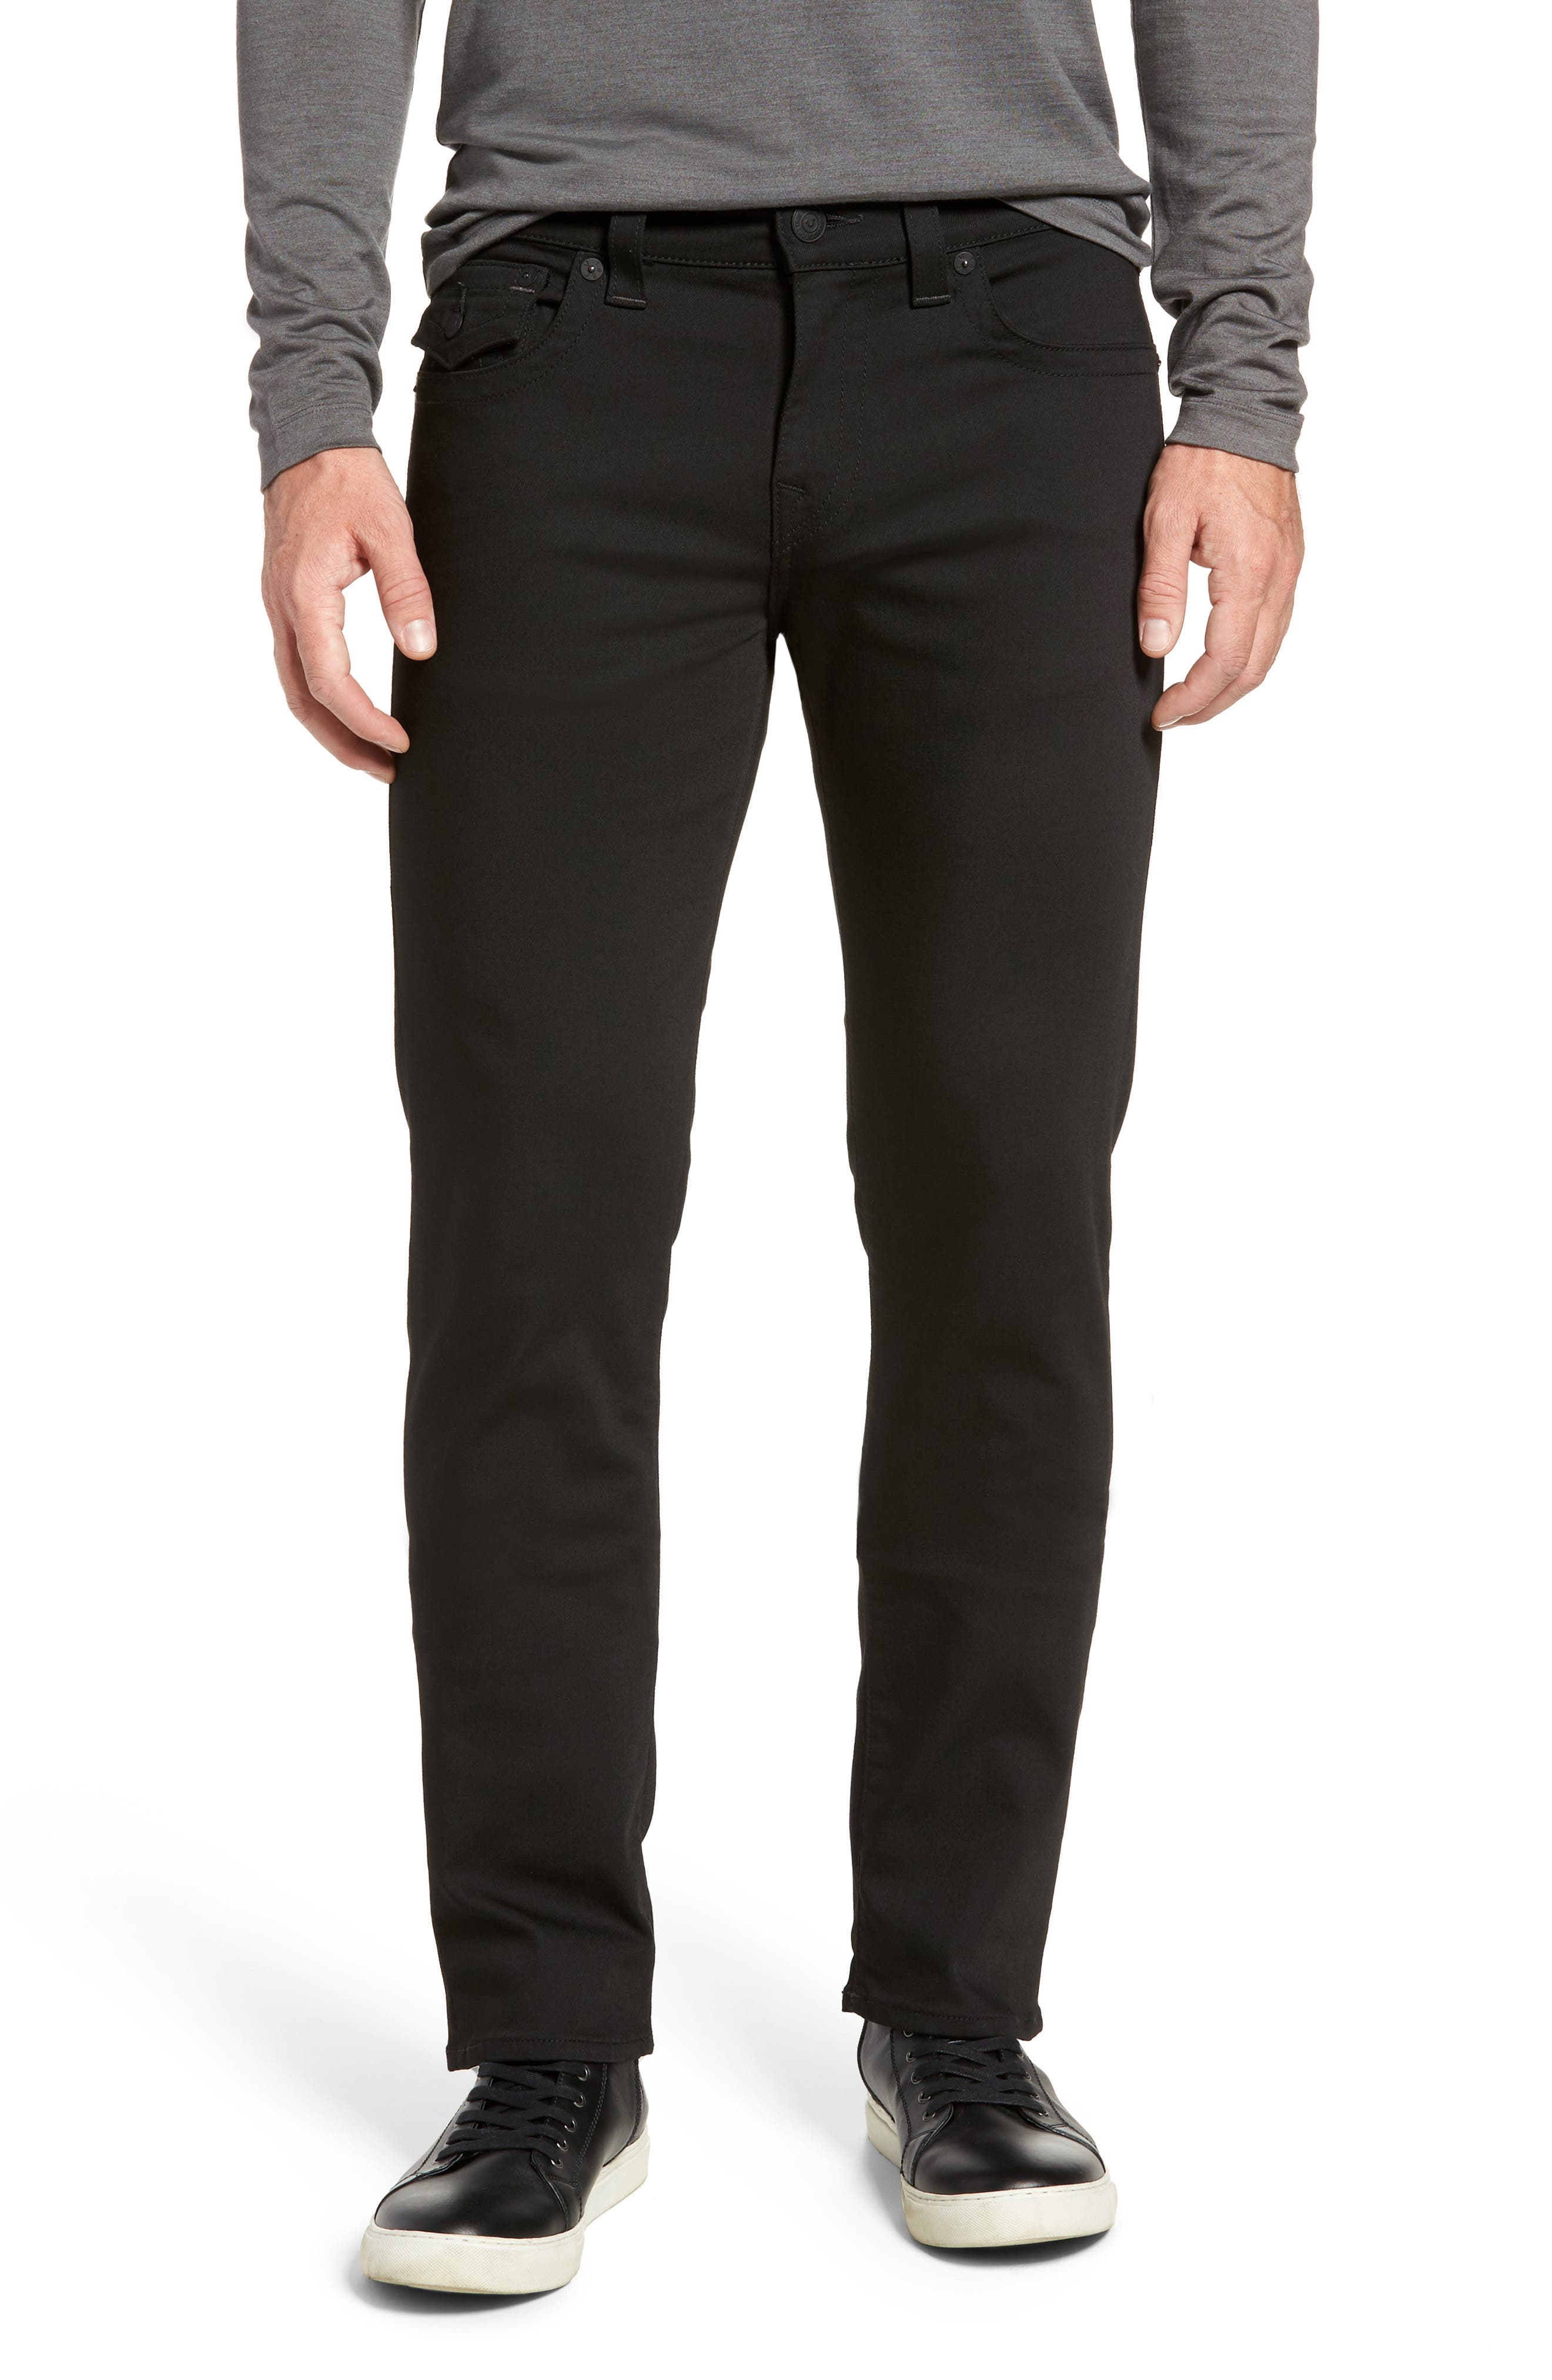 Men's True Religion Brand Jeans Geno Straight Fit Jeans